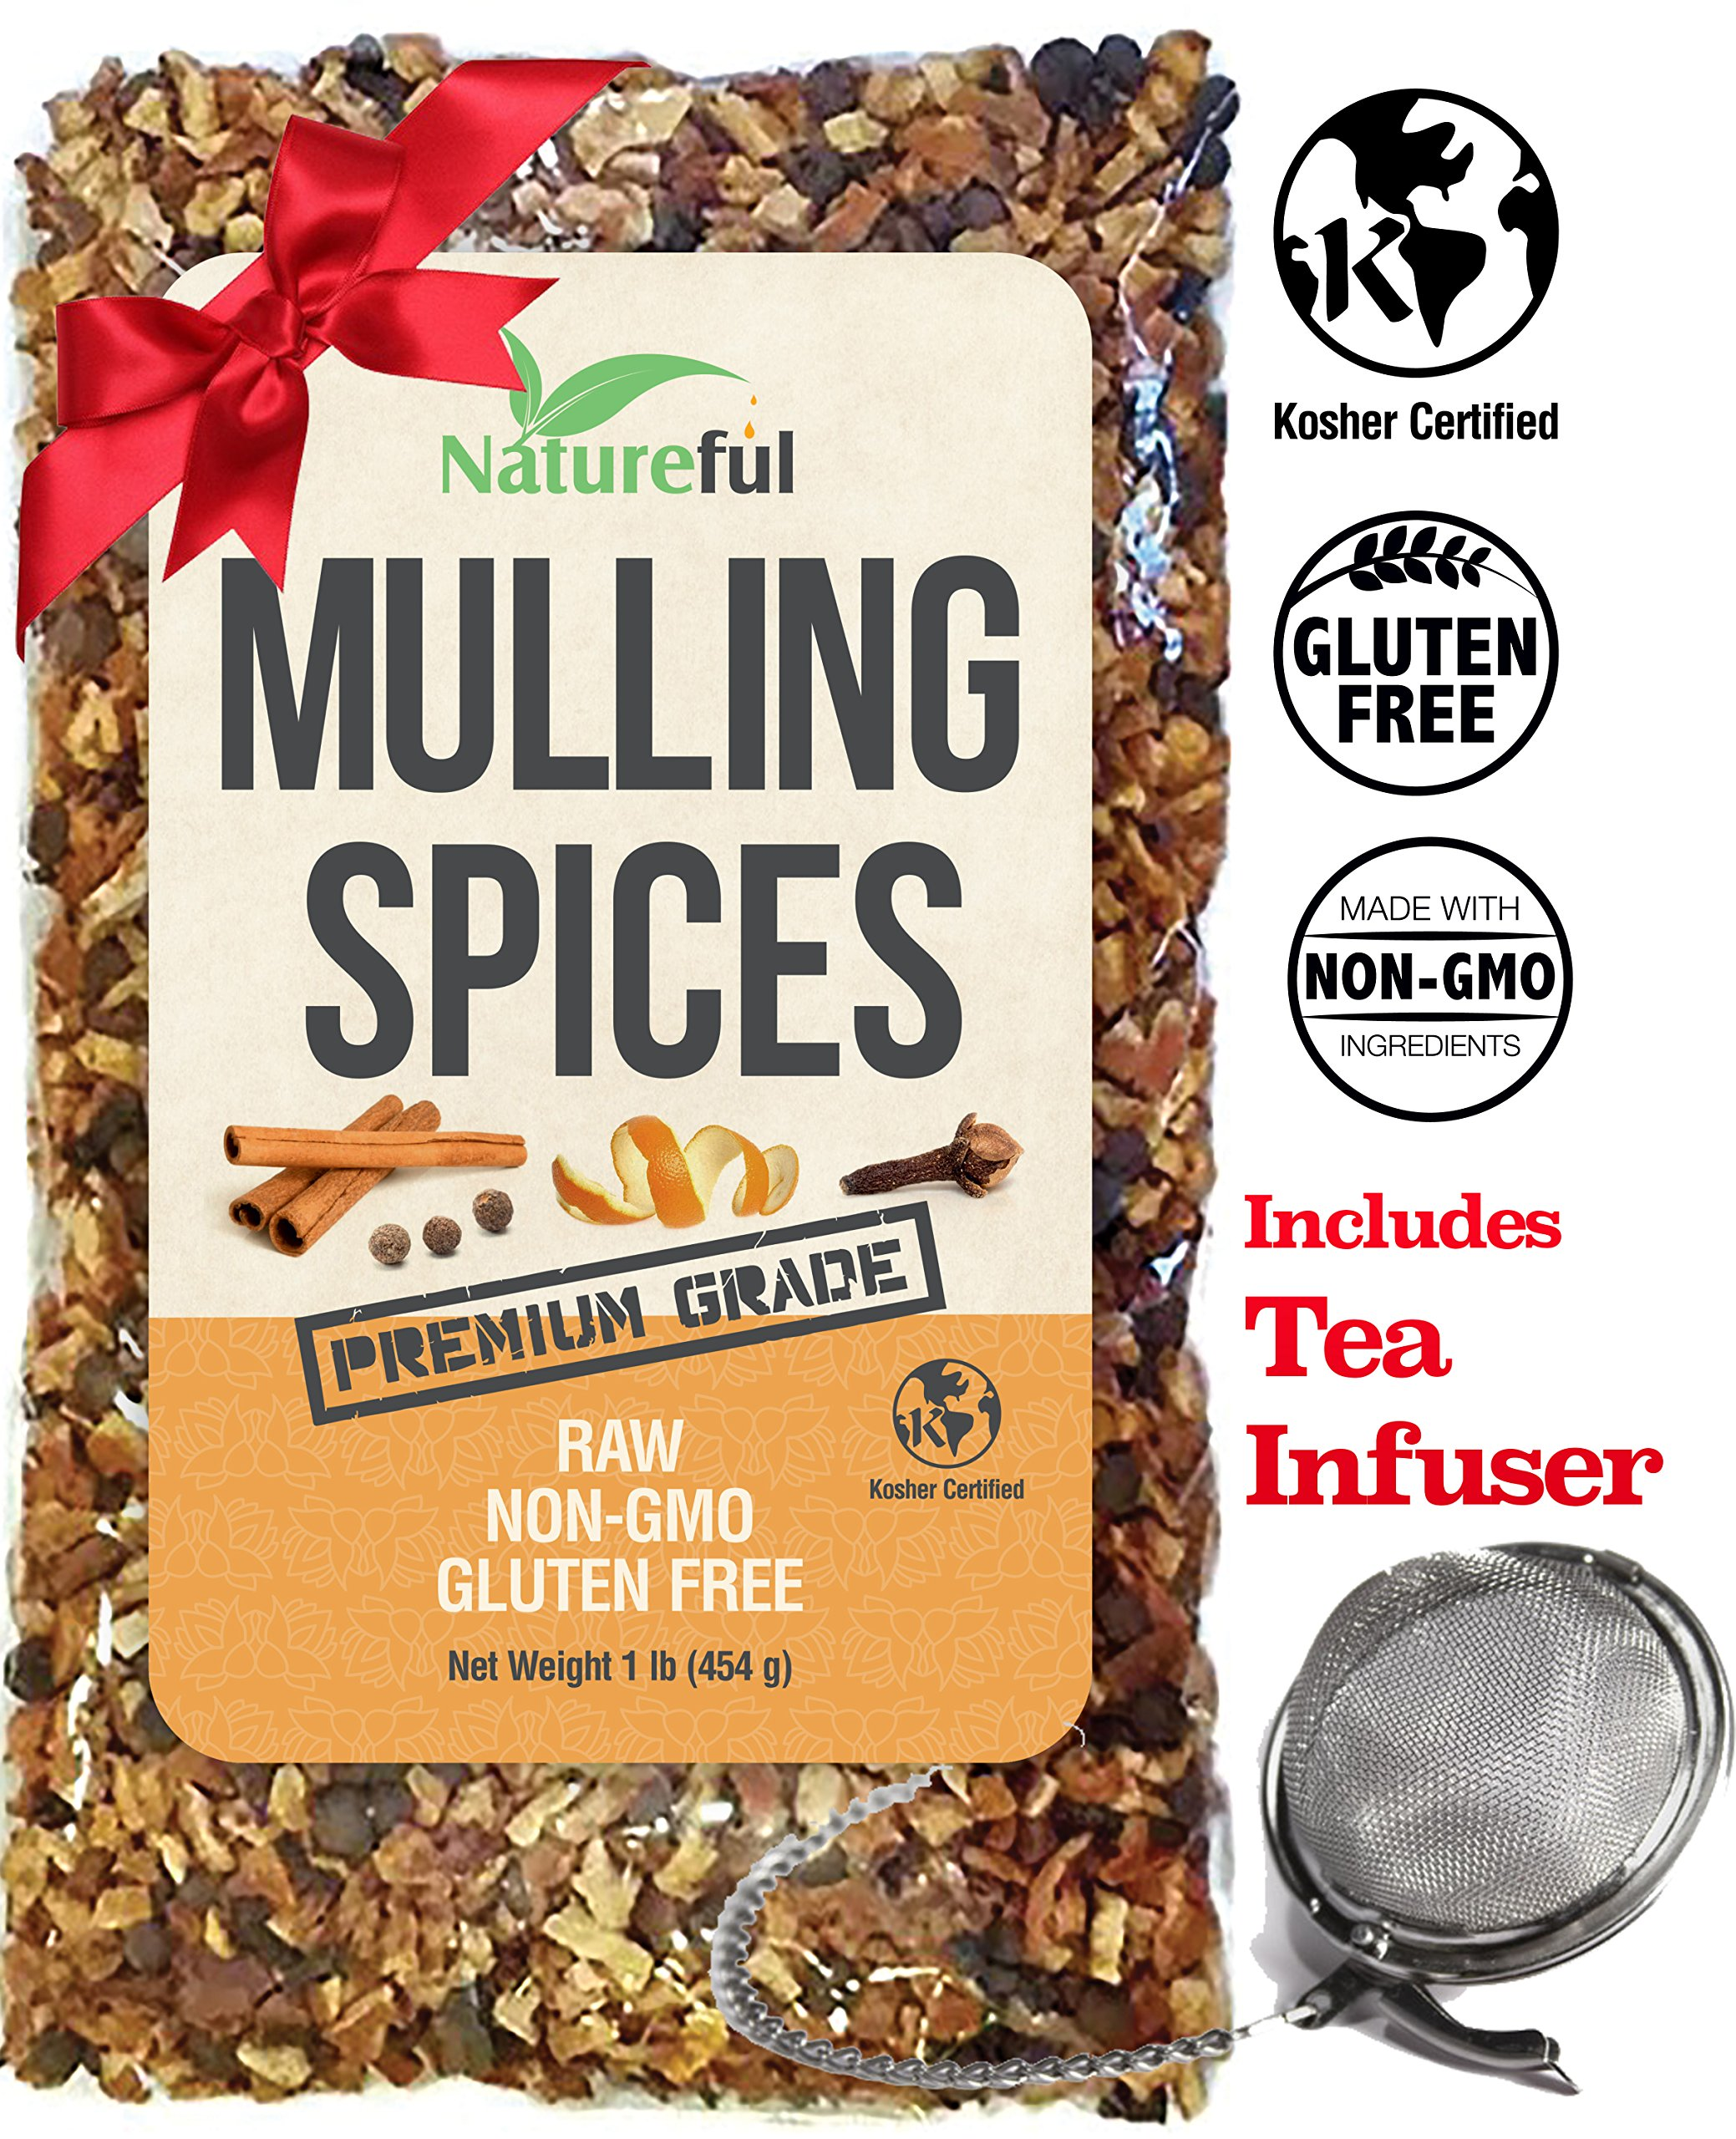 "Mulling Spices for Mulled Wine Apple Cider Teas Kit: Holiday Special with Free 2"" Tea Strainer - Infuser! Original 1 Pound Bulk Bag - Mix of Orange Peel, All Spice, Cloves, Cinnamon Sticks Blend."